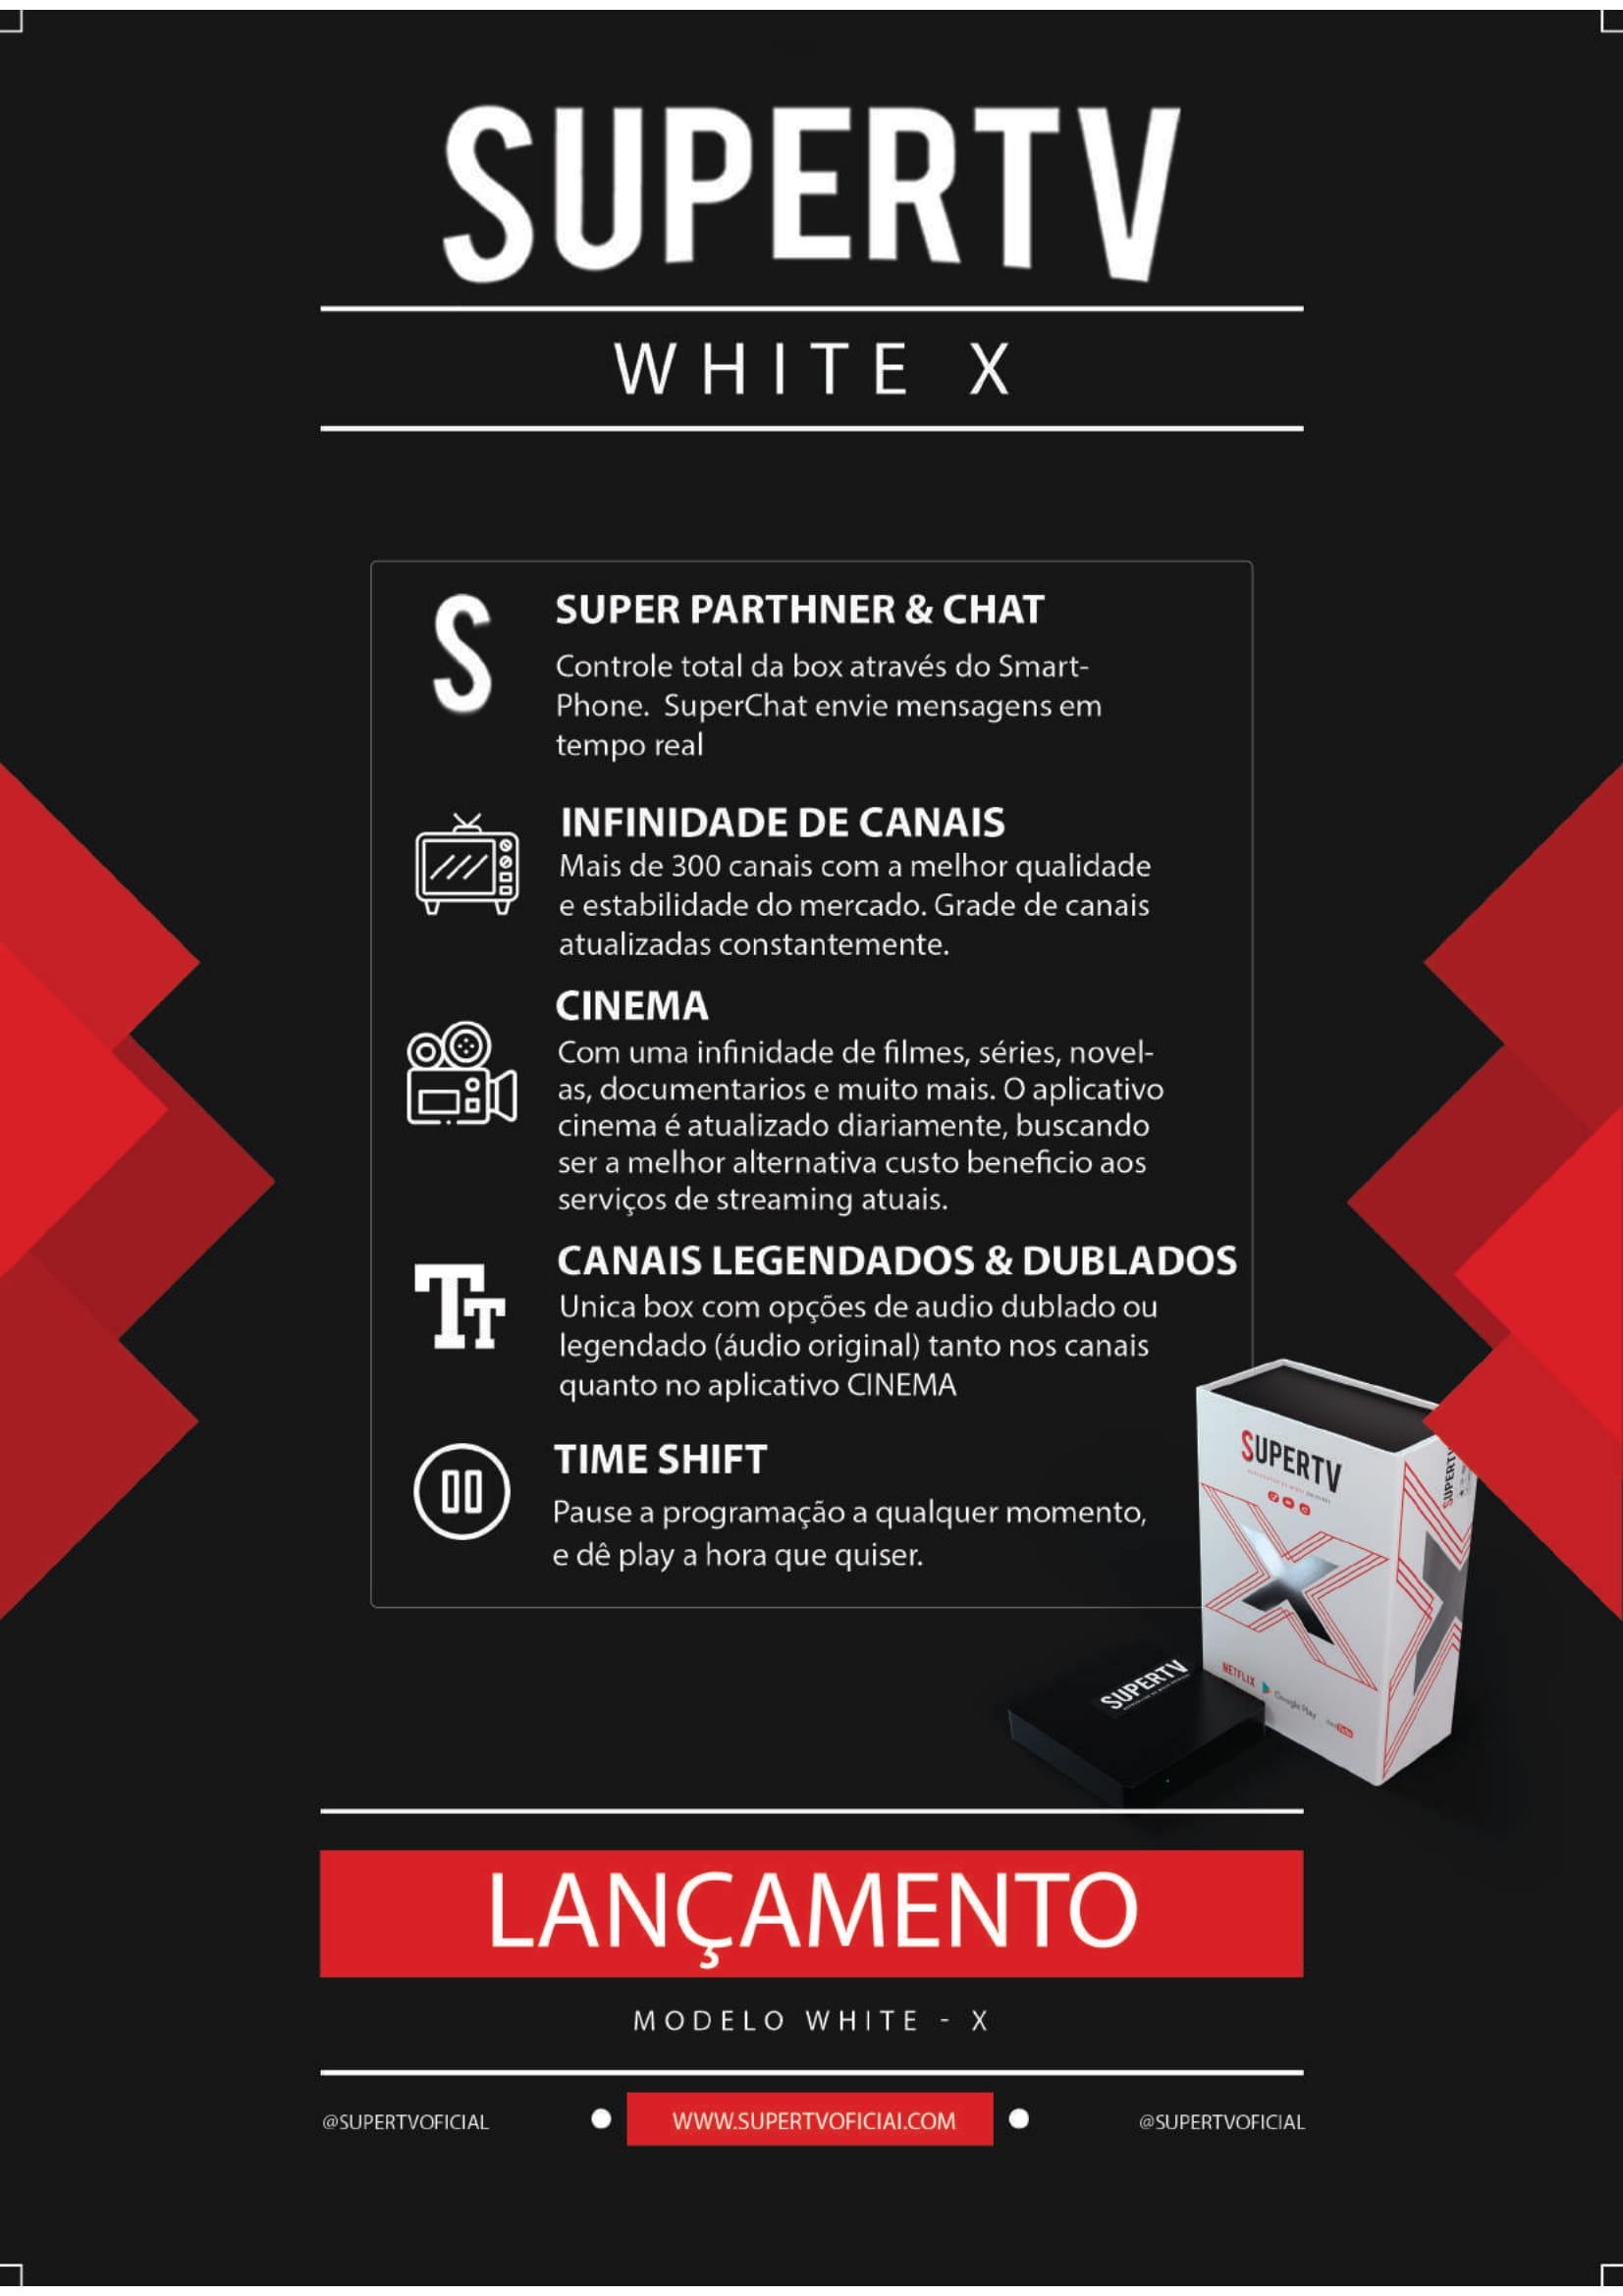 white-x-pdf-2.jpg